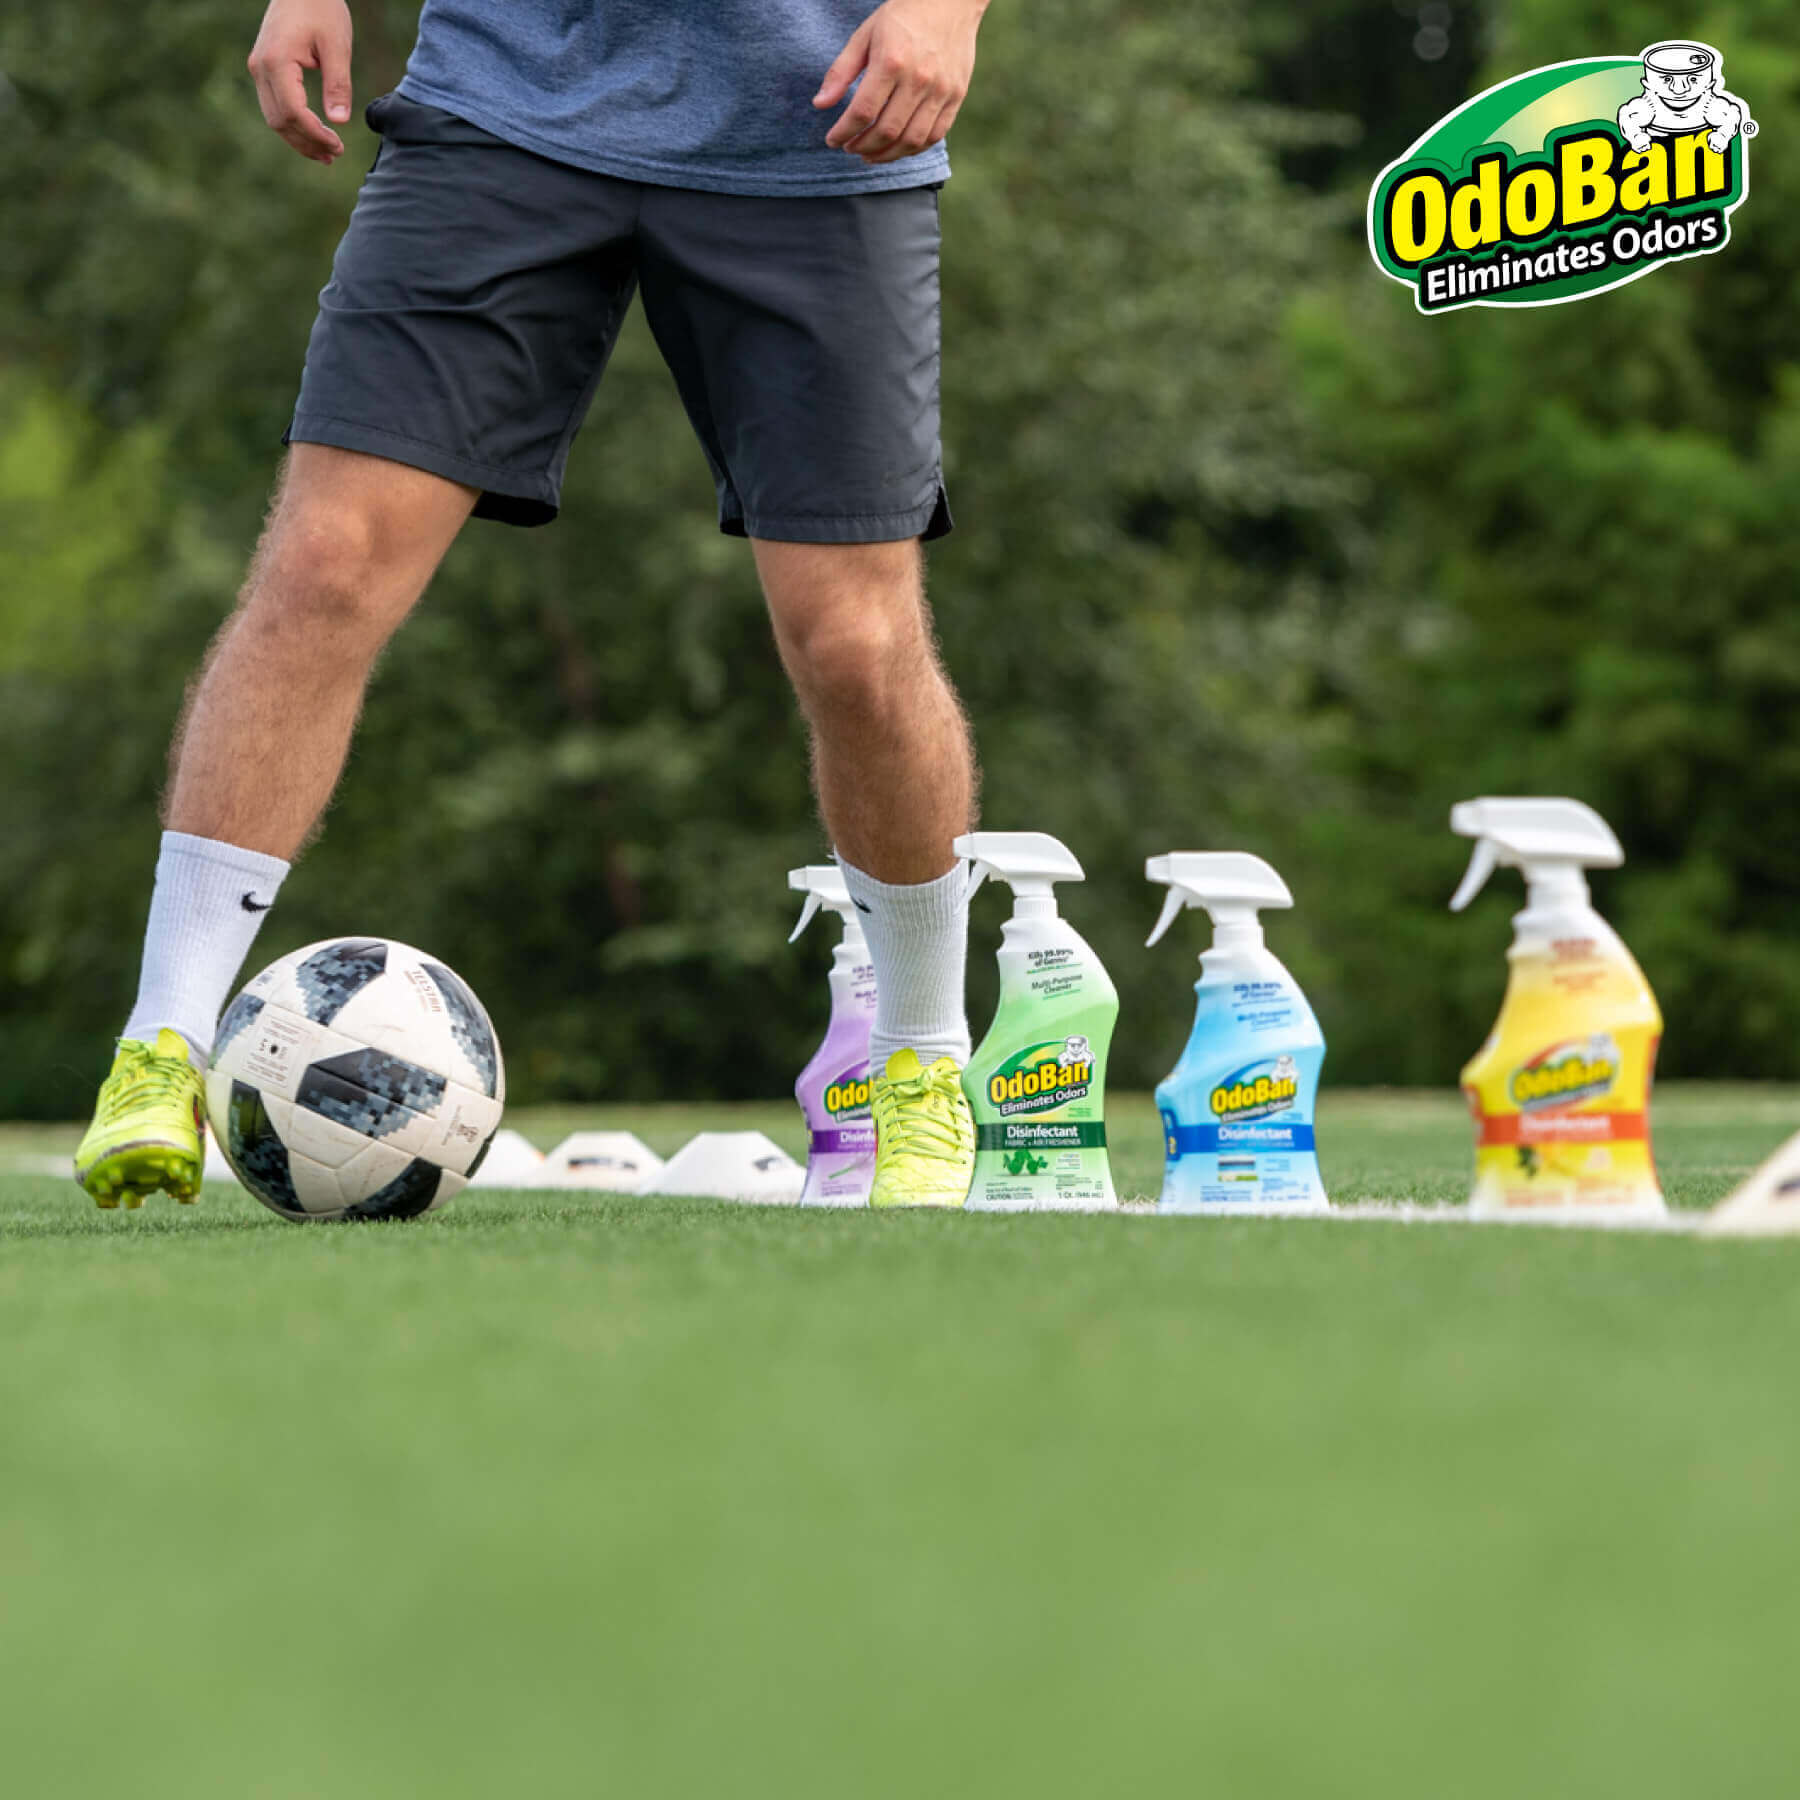 Man dribbling soccer ball between OdoBan products.